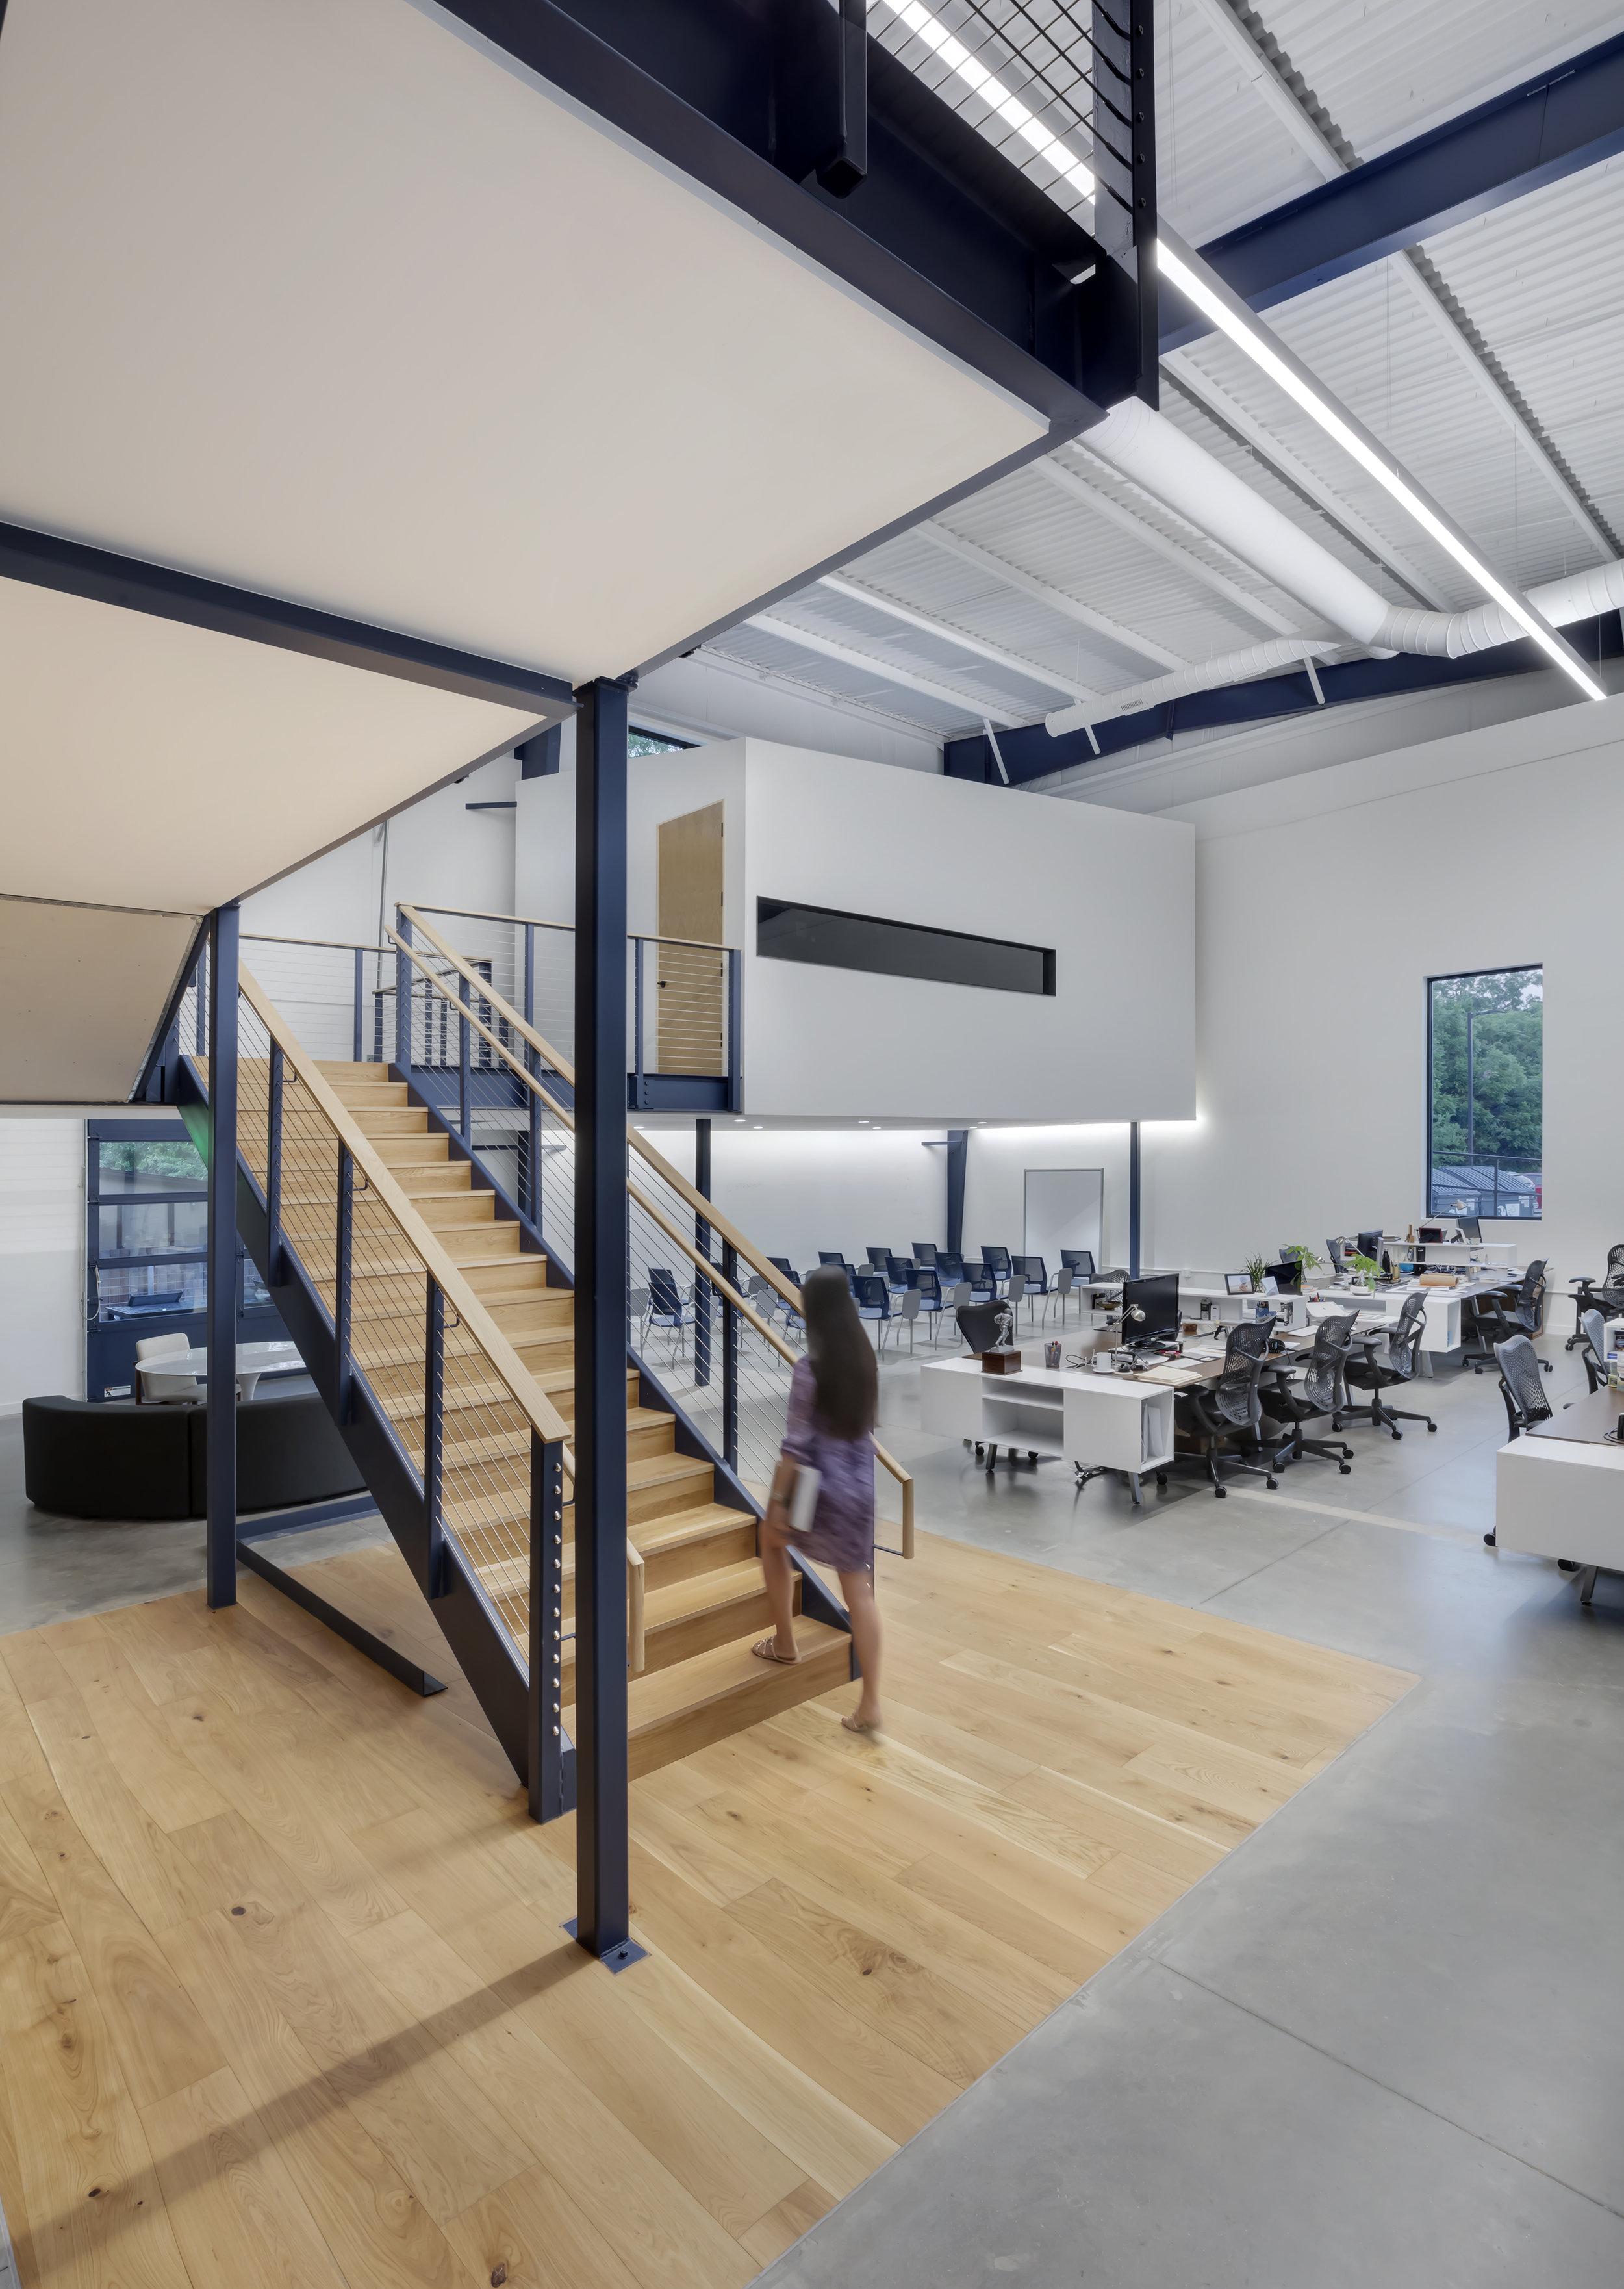 JDI Office by Matt Fajkus MF Architecture. Photo 2 by Charles Davis Smith.jpg